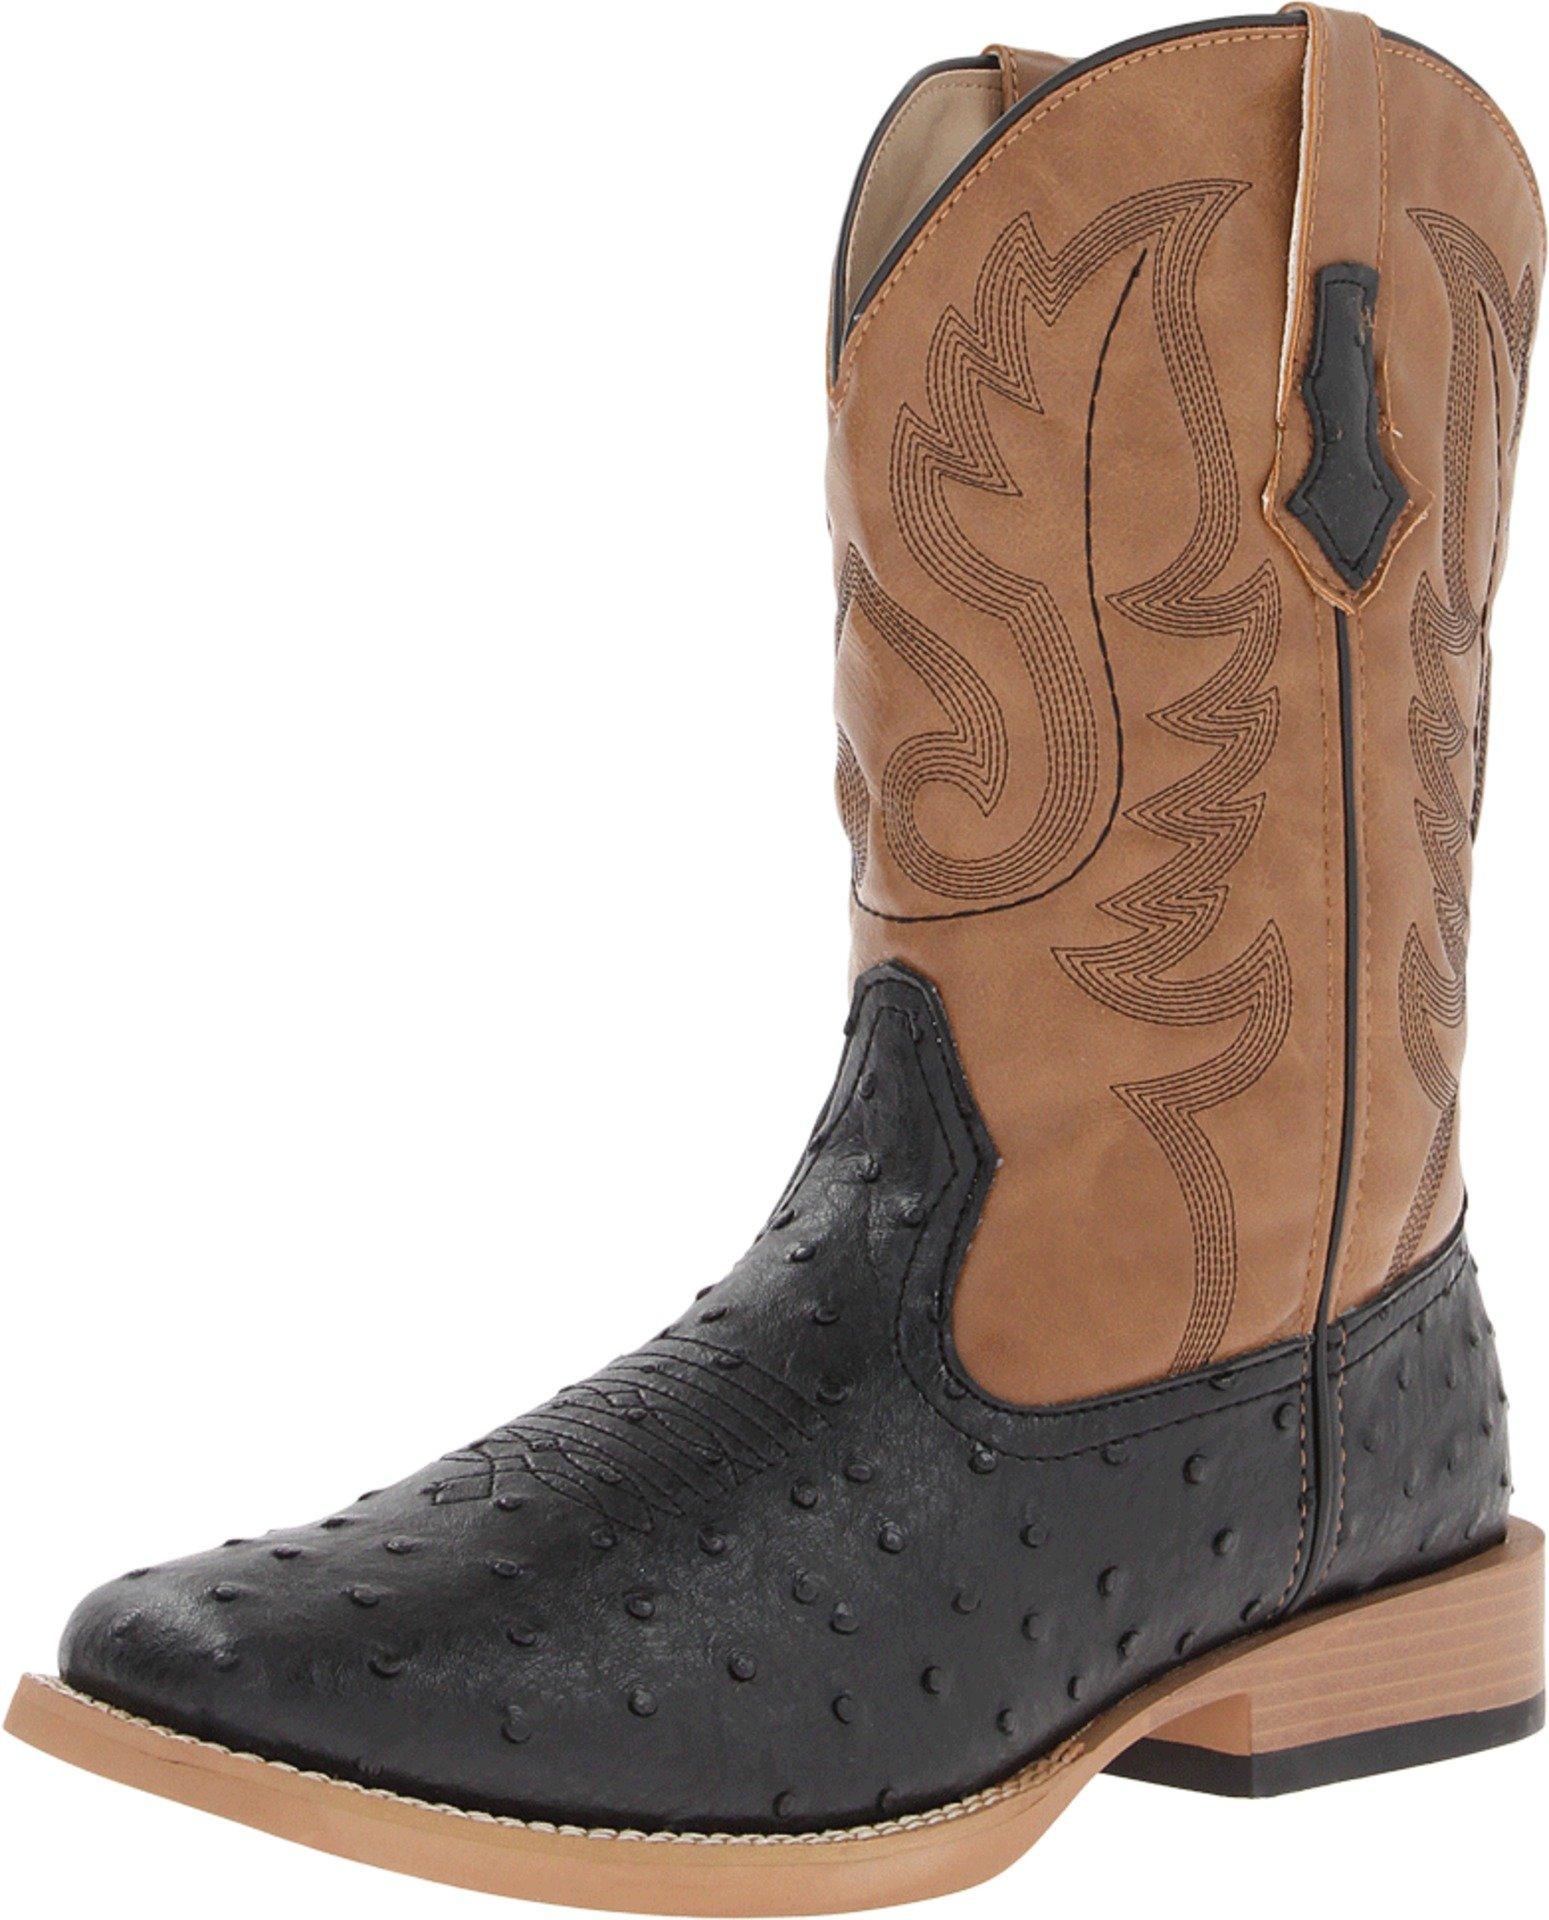 Roper Men's Ostrich Print Square Toe Cowboy Boot Black Faux Leather/Western Stitch 8.5 D - Medium